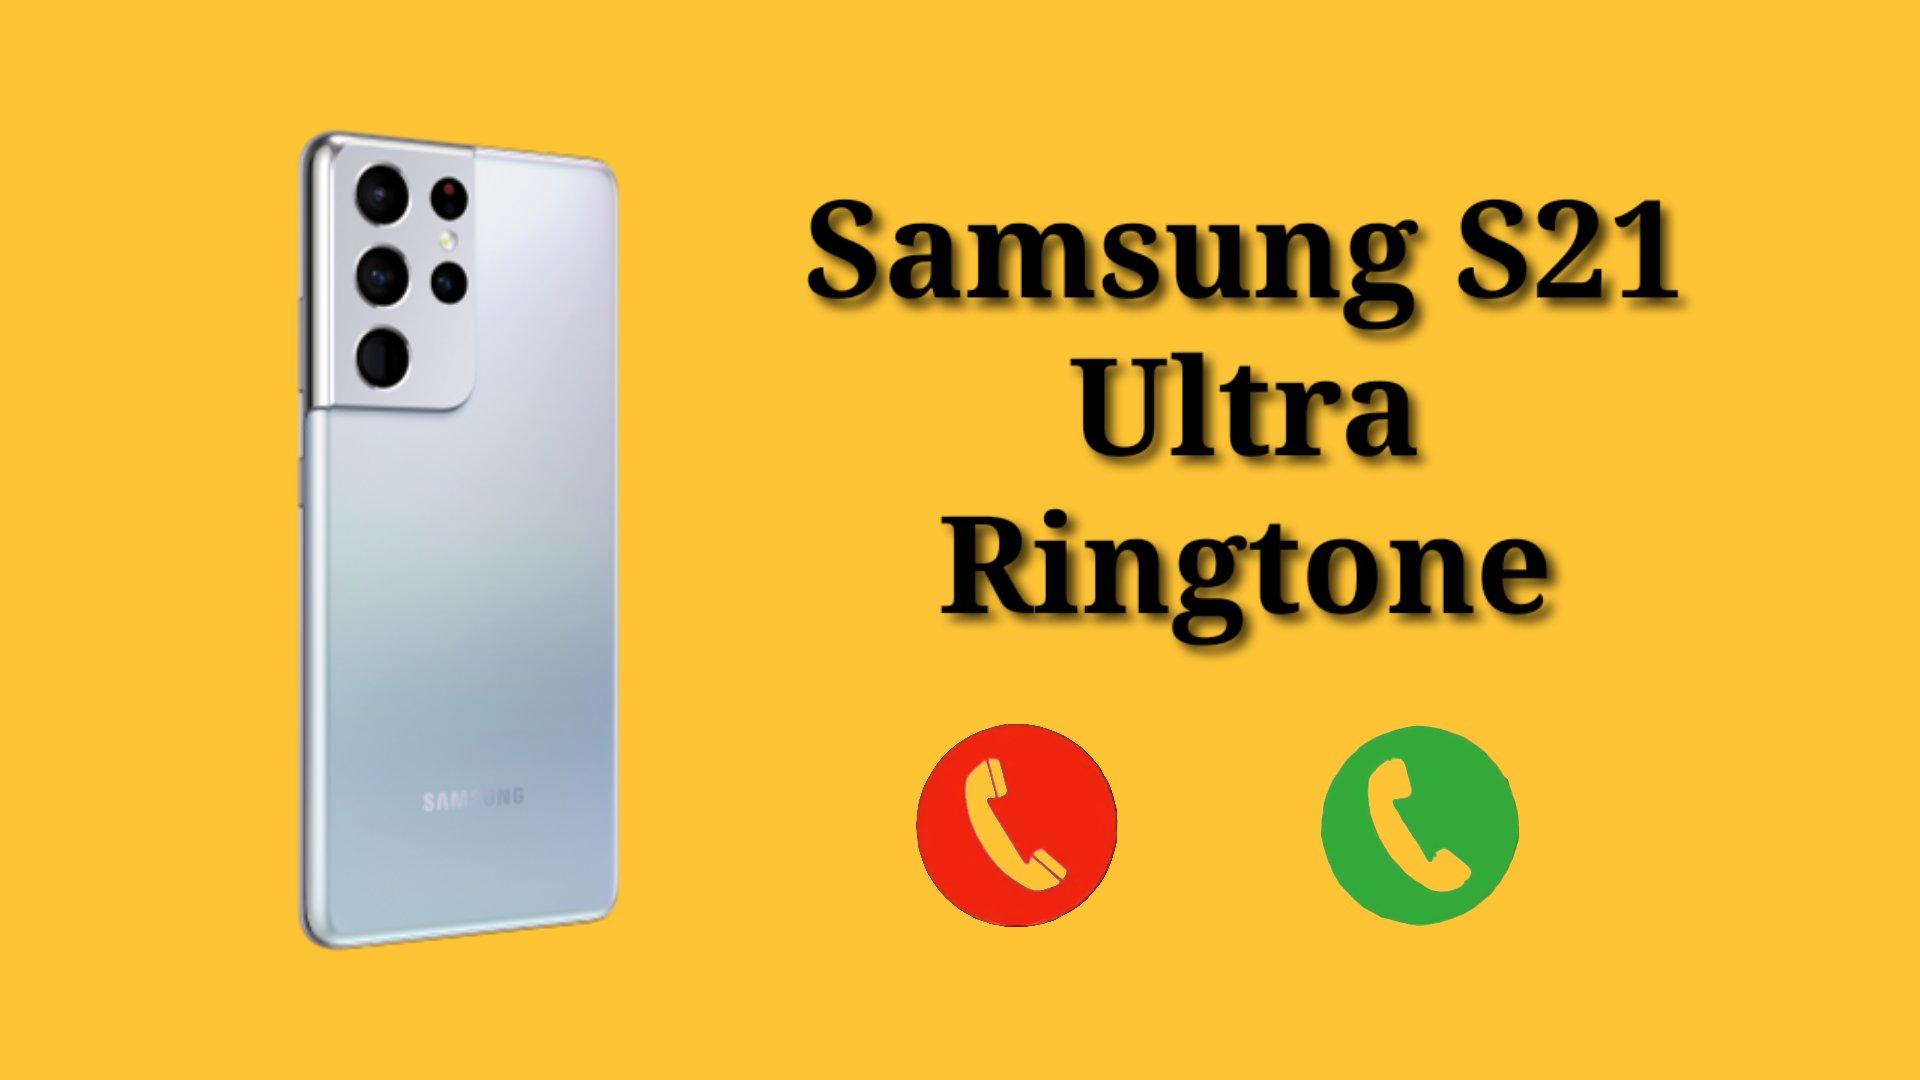 Samsung S21 Ultra Ringtone Download